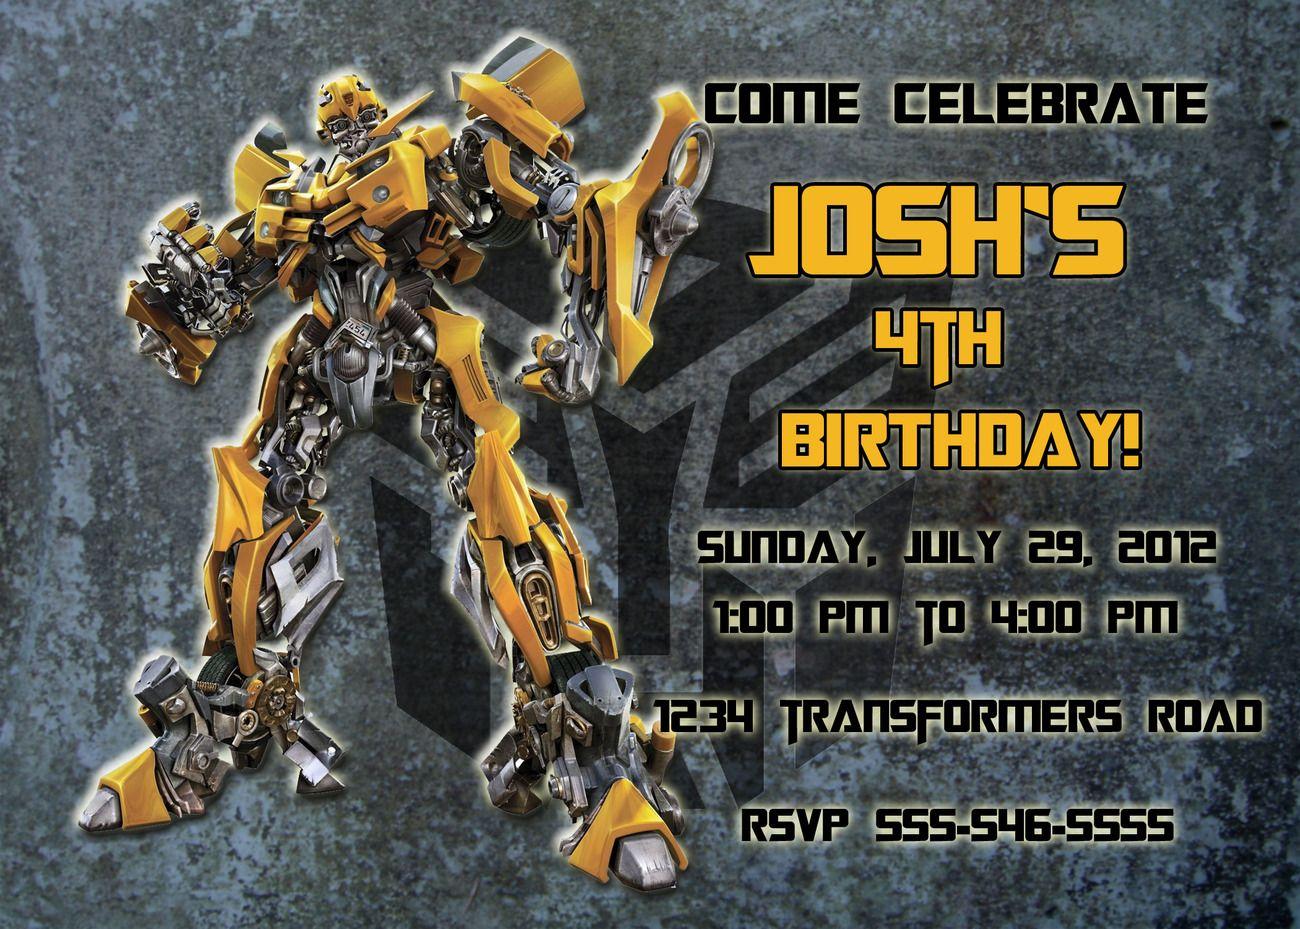 Transformer Birthday Invitations For Andrew Transformer Birthday Free Printable Birthday Invitations Printable Birthday Invitations